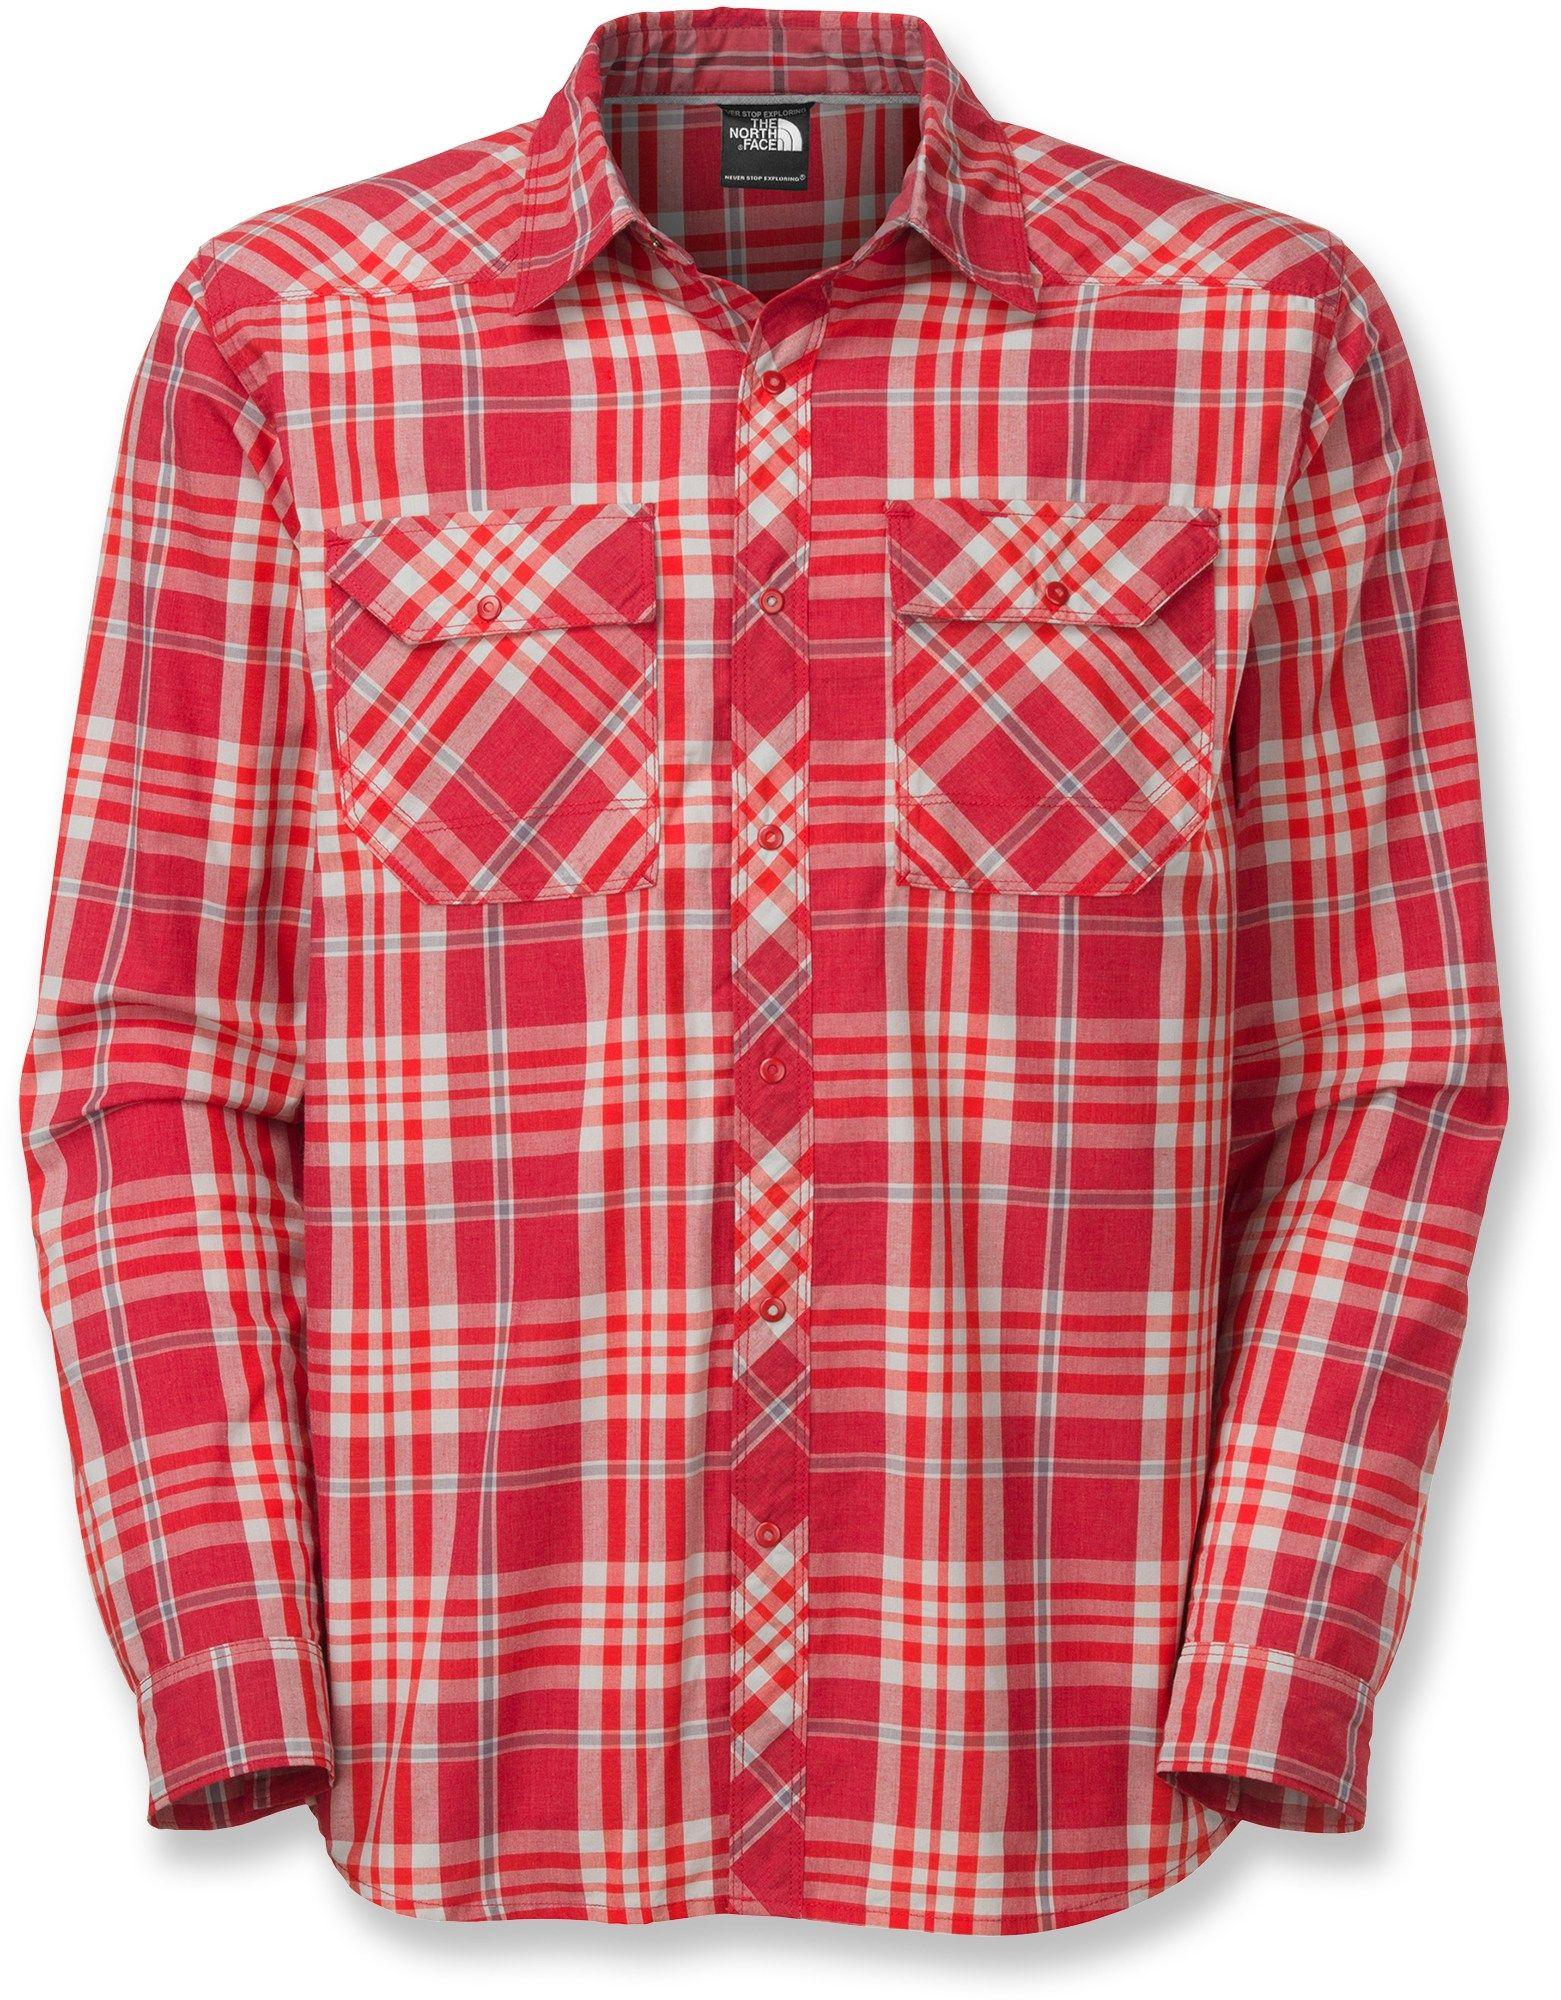 The North Face Male Orangahang Shirt Men s  9eae4d0ce36